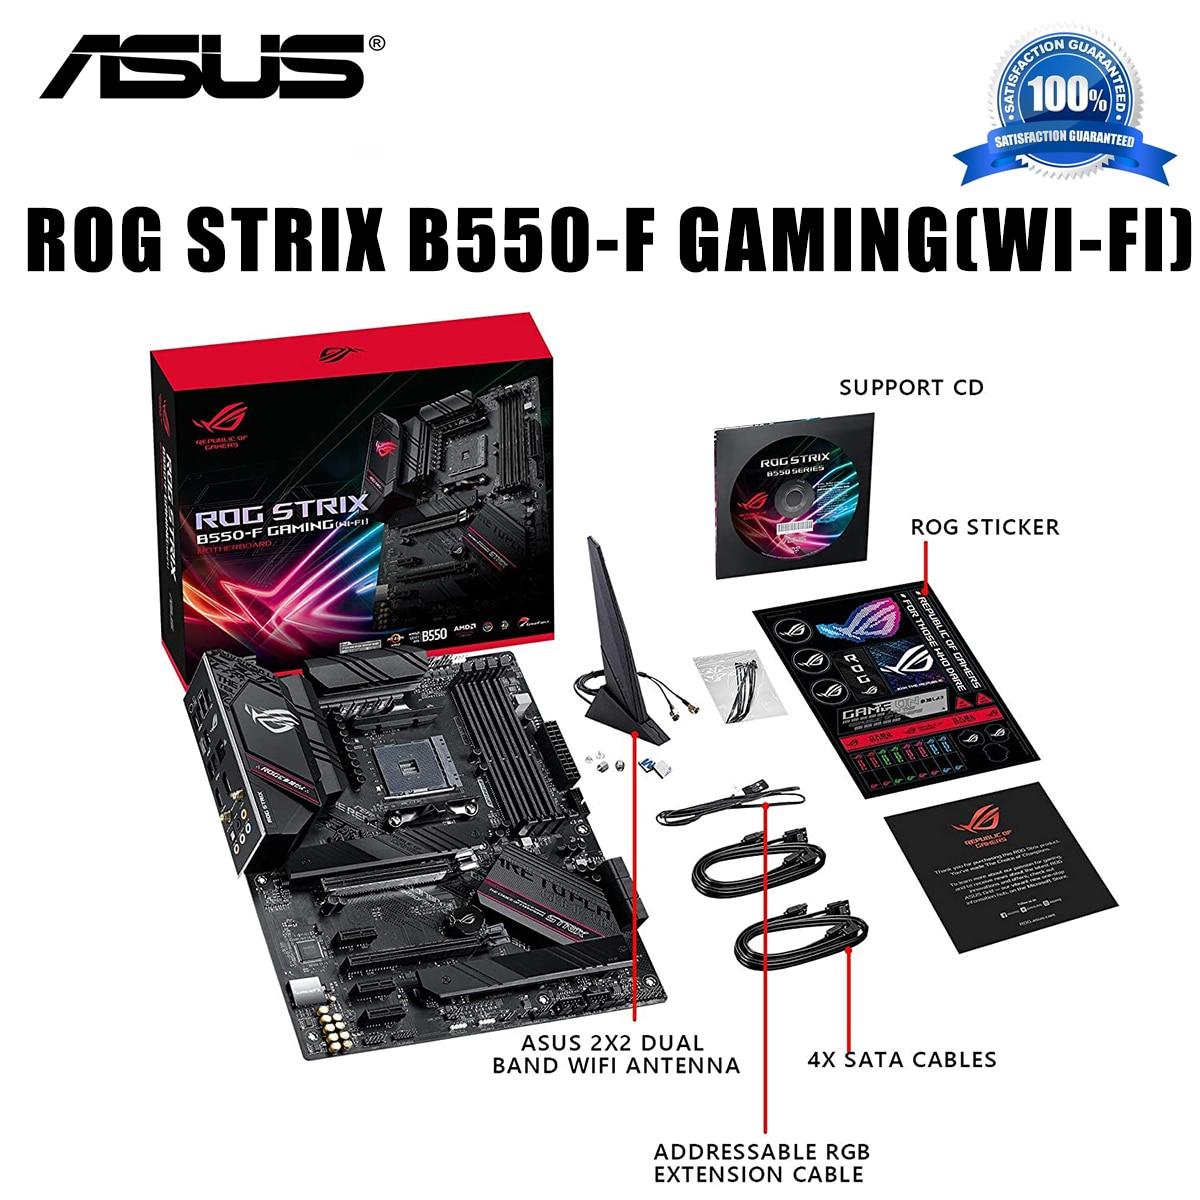 AM4 Asus TUF GAMING B450M-PRO S Gaming Motherboard AMD B450 M.2 SSD PCI-E 3.0 CrossFireX DDR4 CHIA AMD B450 Gaming Placa-mãe AM4